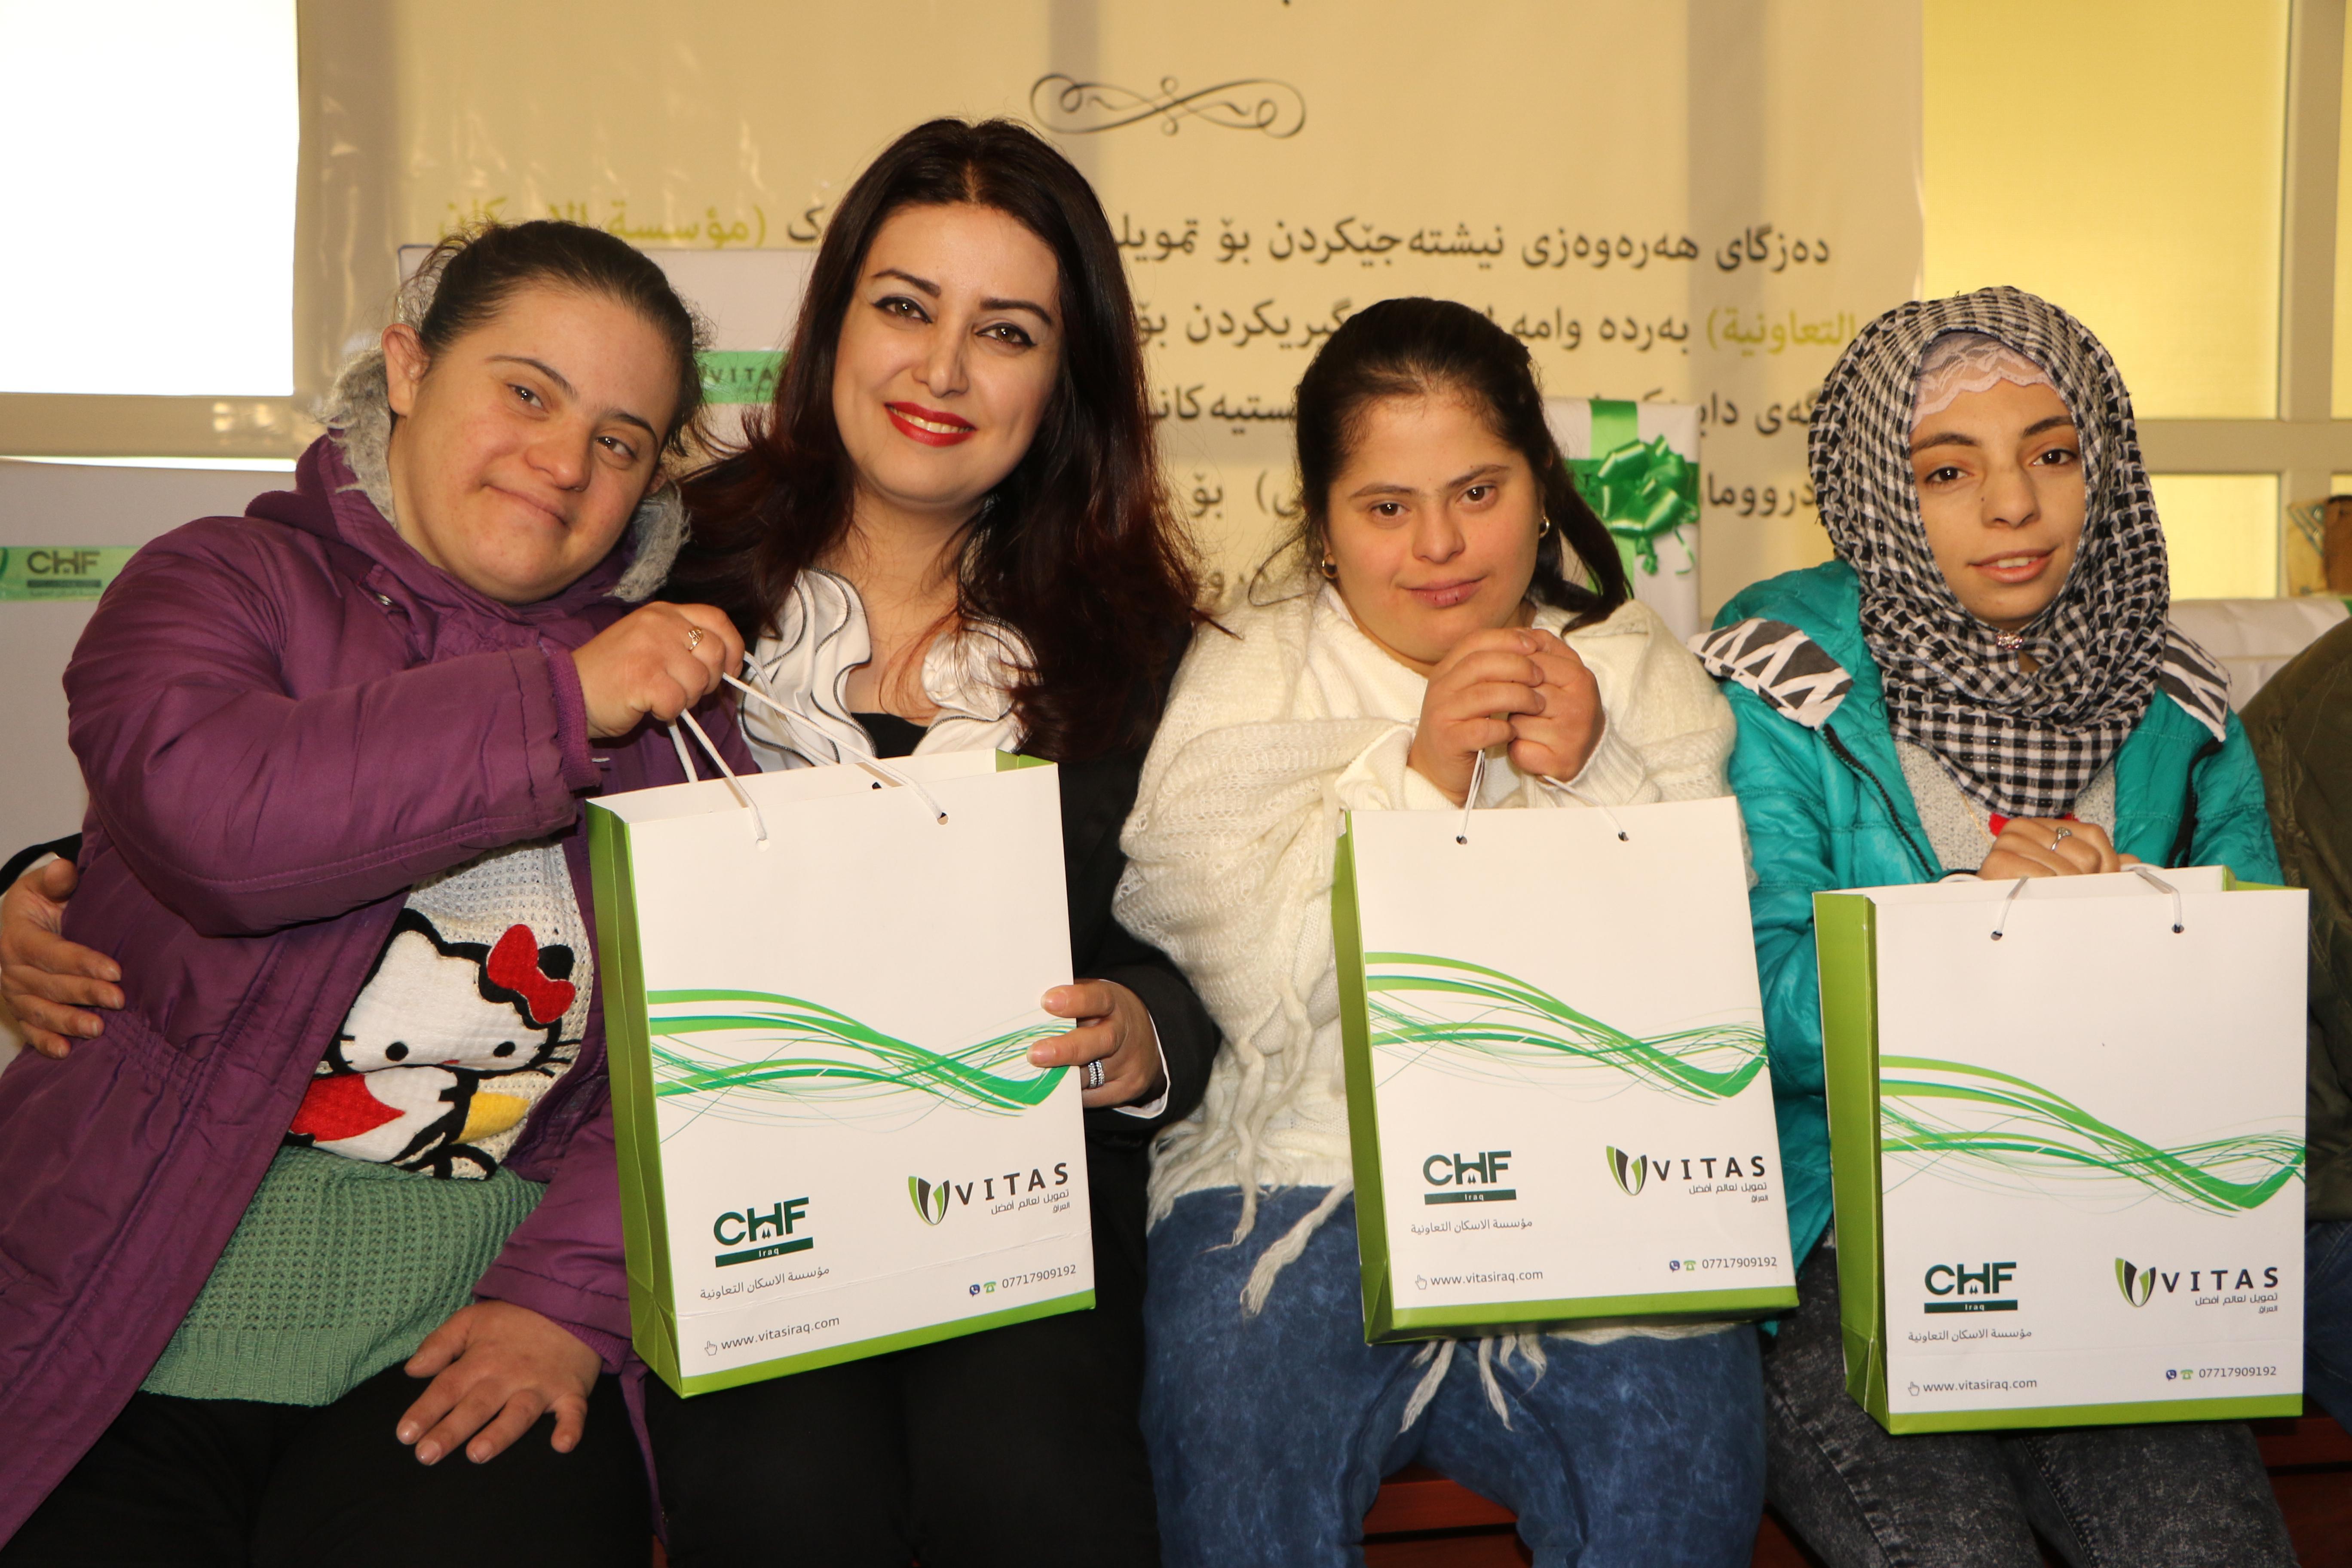 community events - Equipping vocational rehabilitation institutes